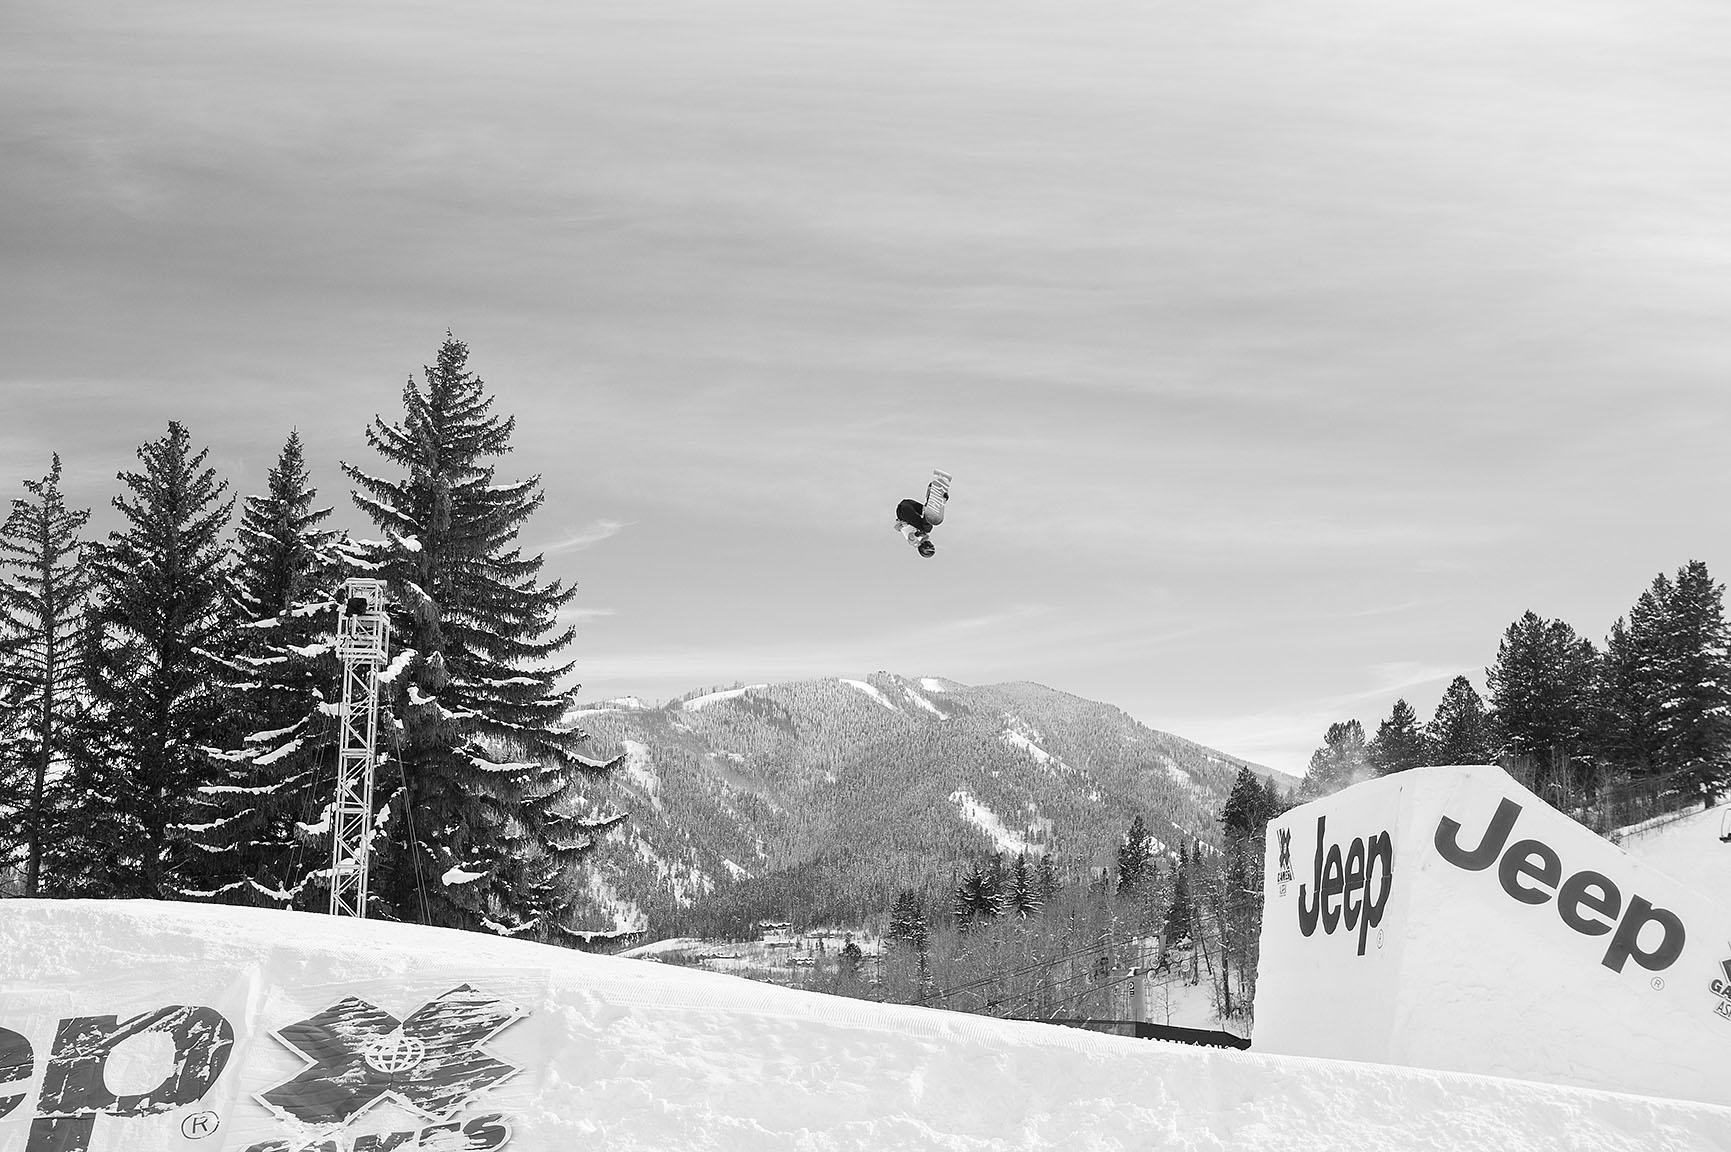 Julia Marino, Women's Snowboard Slopestyle